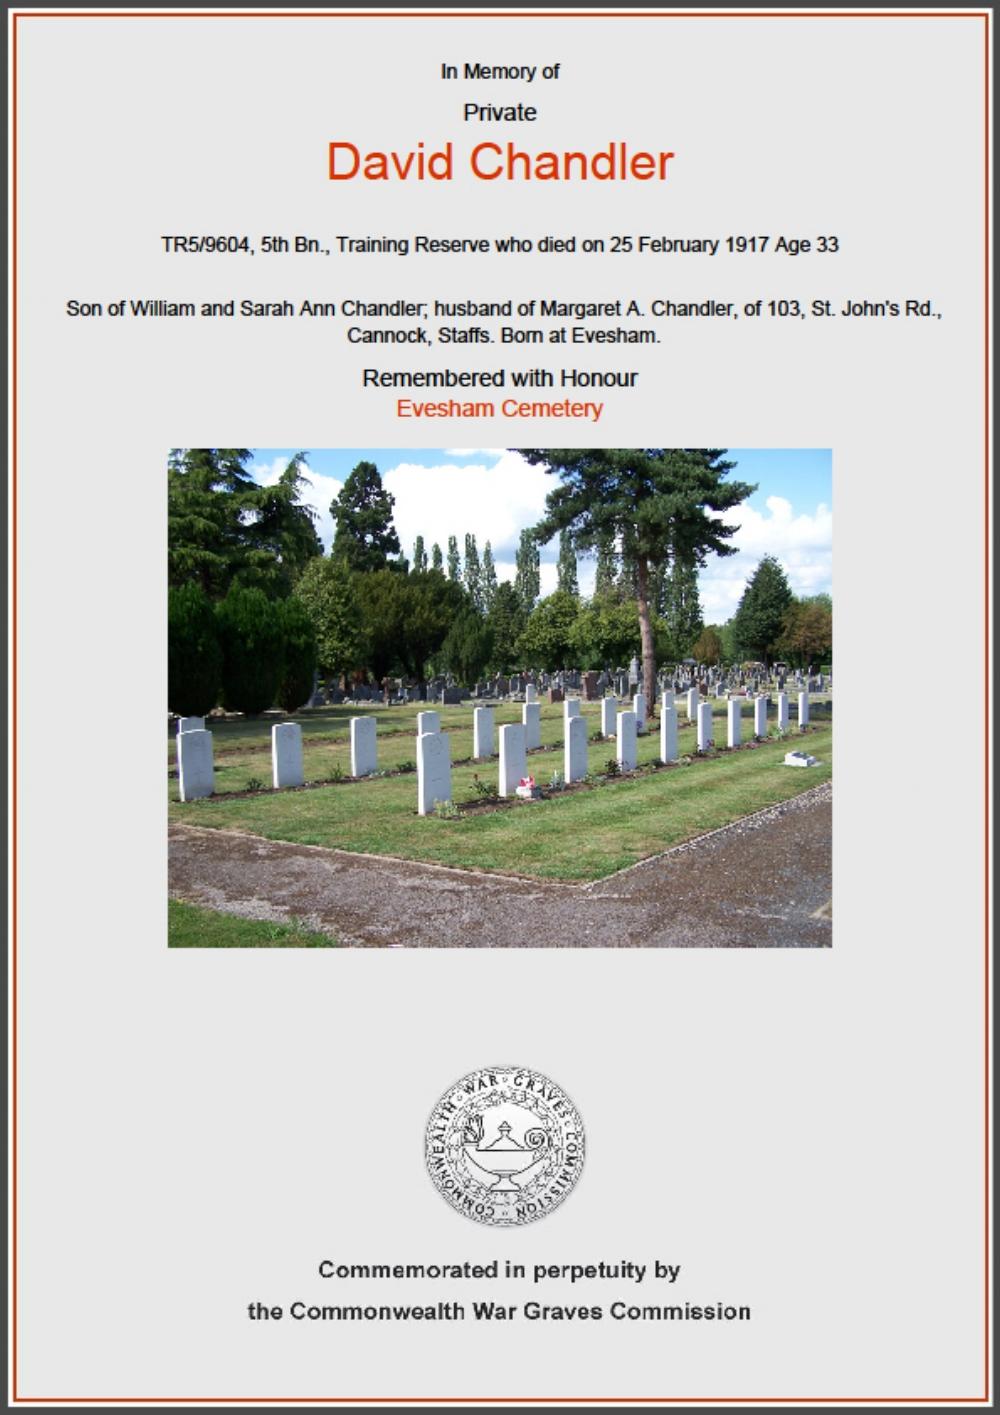 Commemorative certificate in memory of Private David Chandler